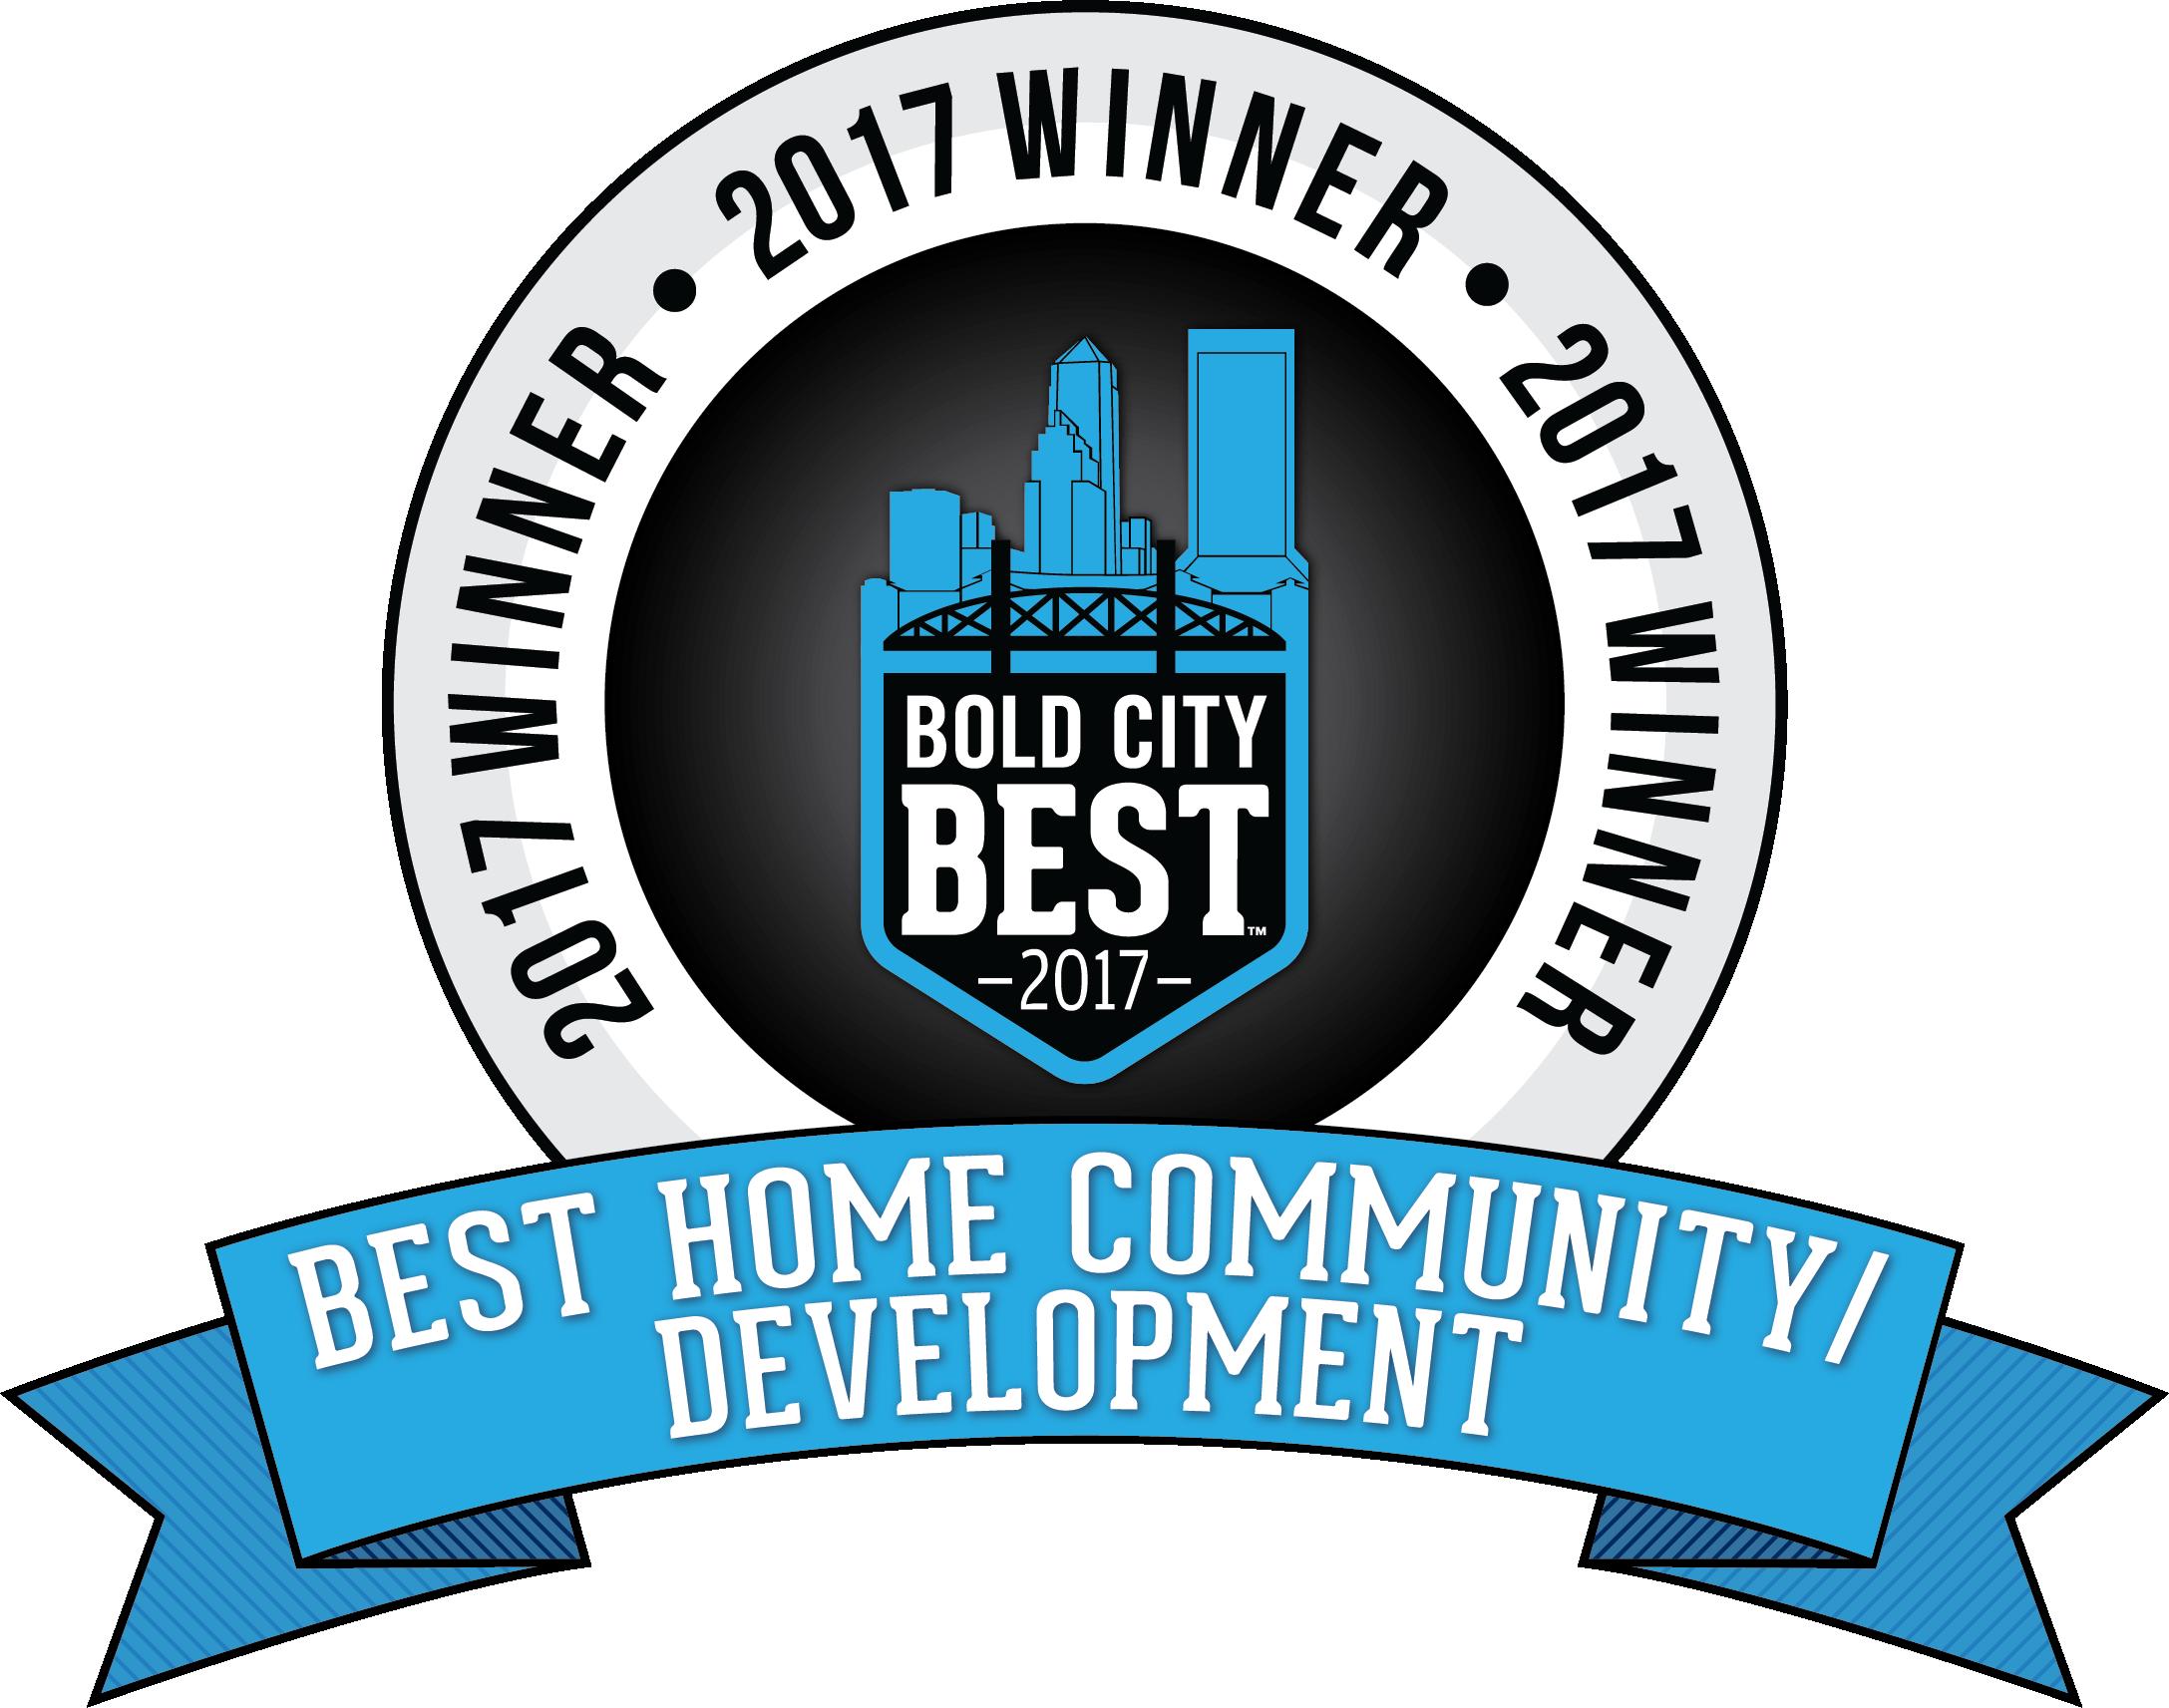 Nocatee Wins 2017 Bold City Best Home Community